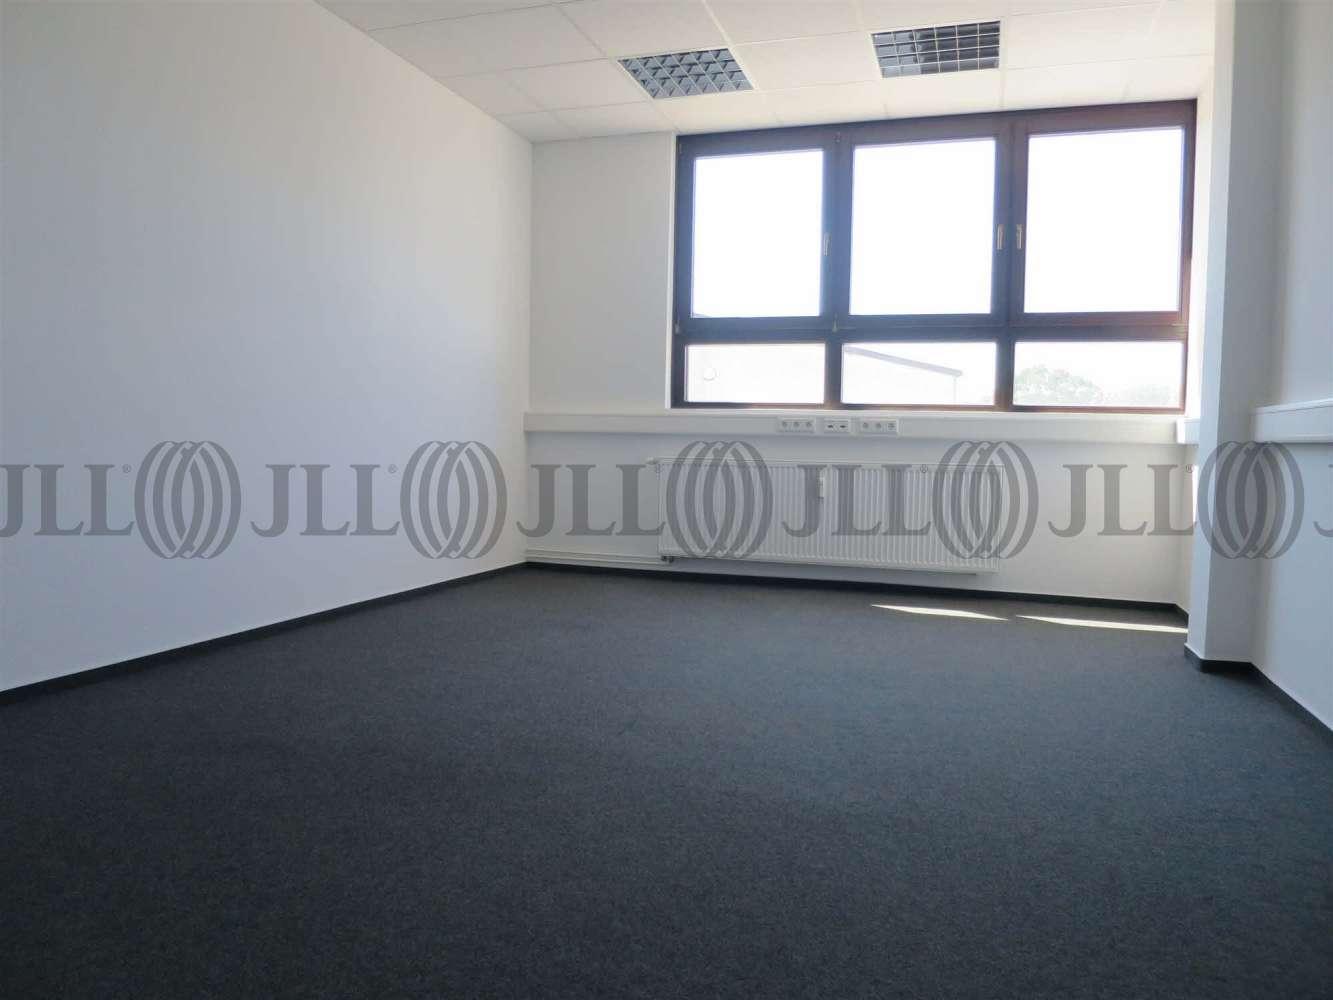 Büros Heidelberg, 69123 - Büro - Heidelberg, Pfaffengrund - F2195 - 10873704